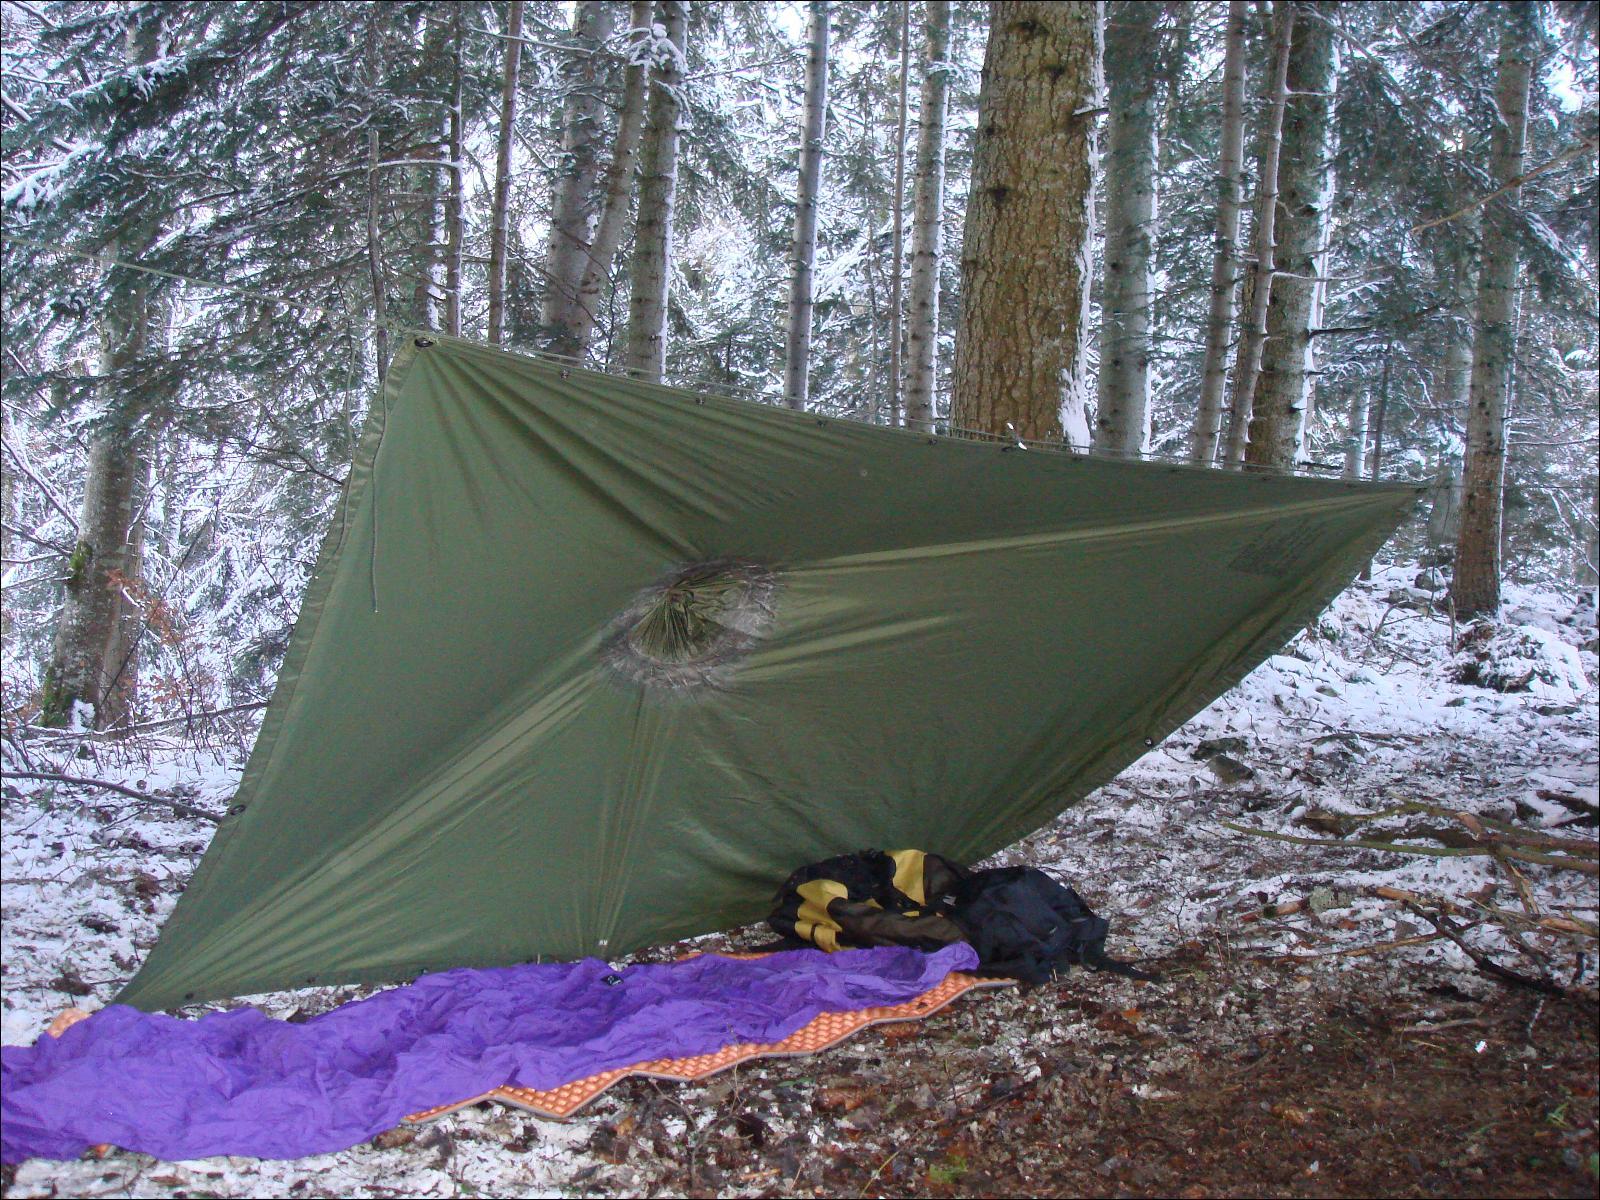 Abri bivouac ou tarp for Un abri ou un abris